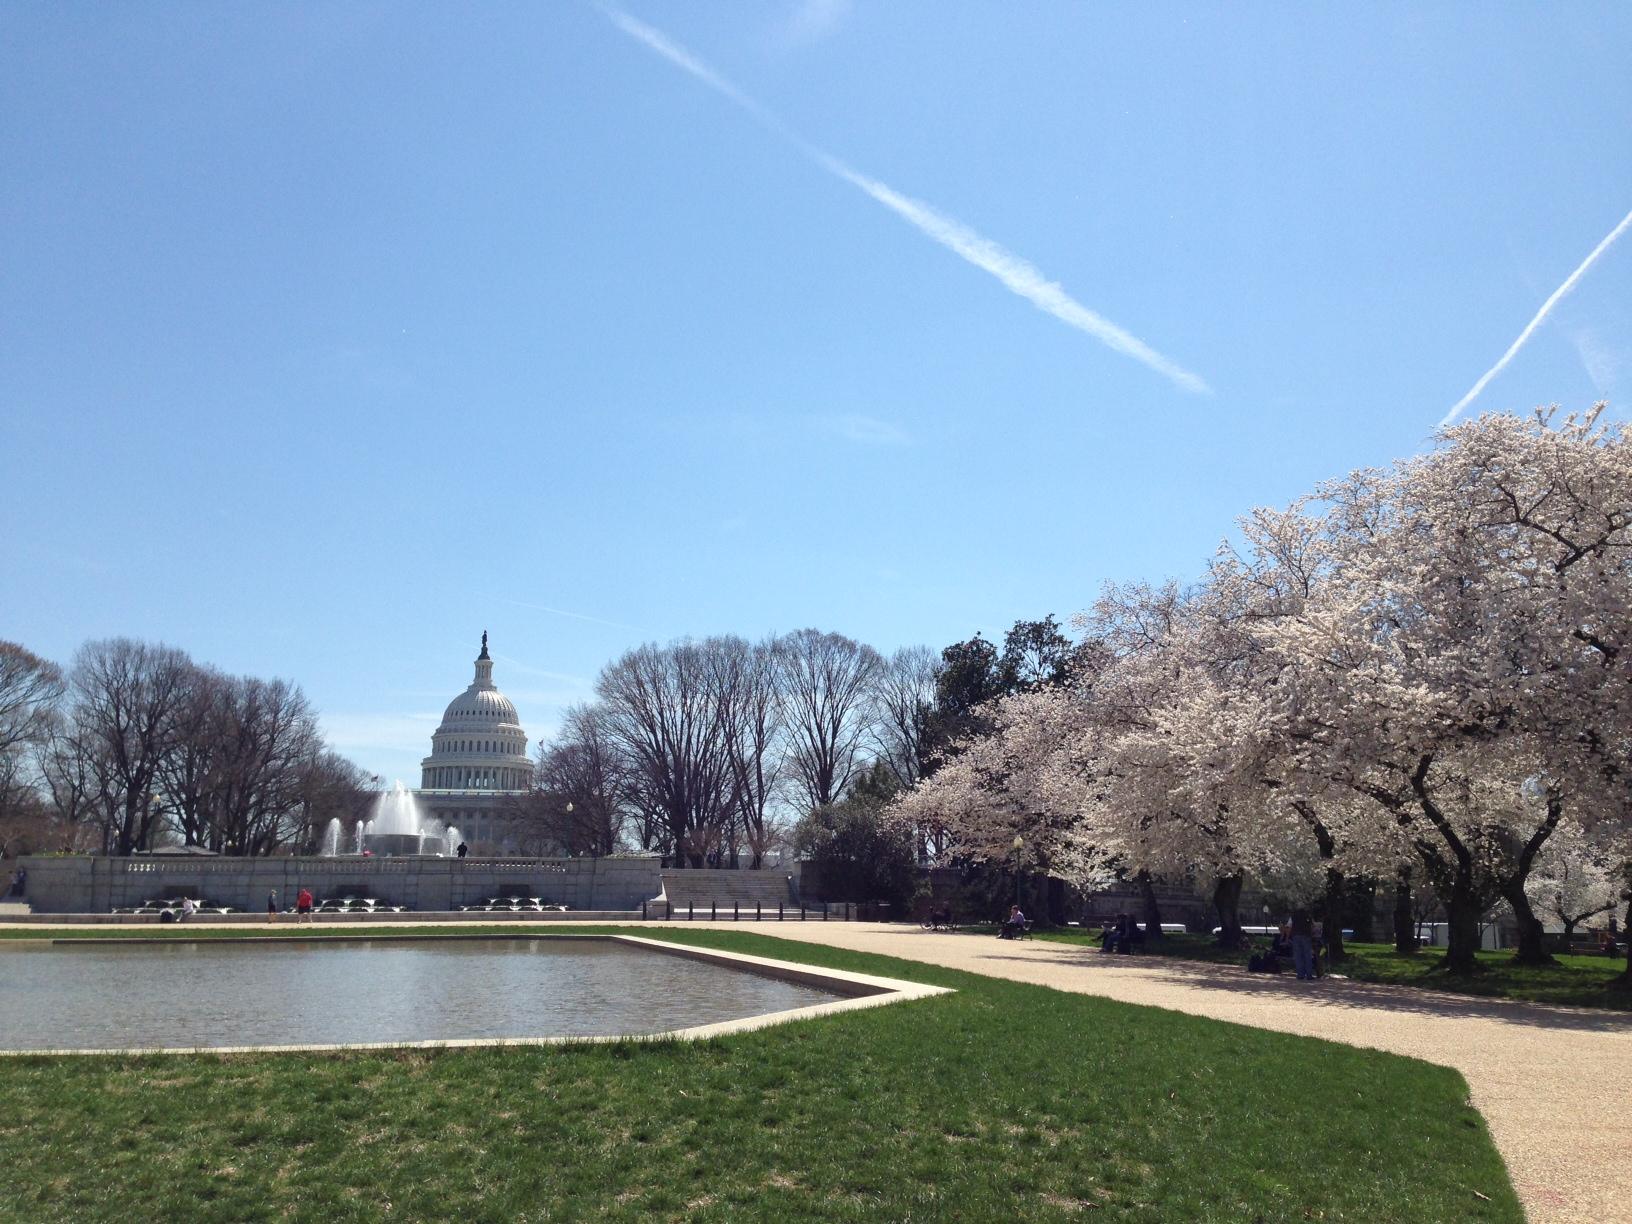 Will springtime inspire comprehensive immigration reform?